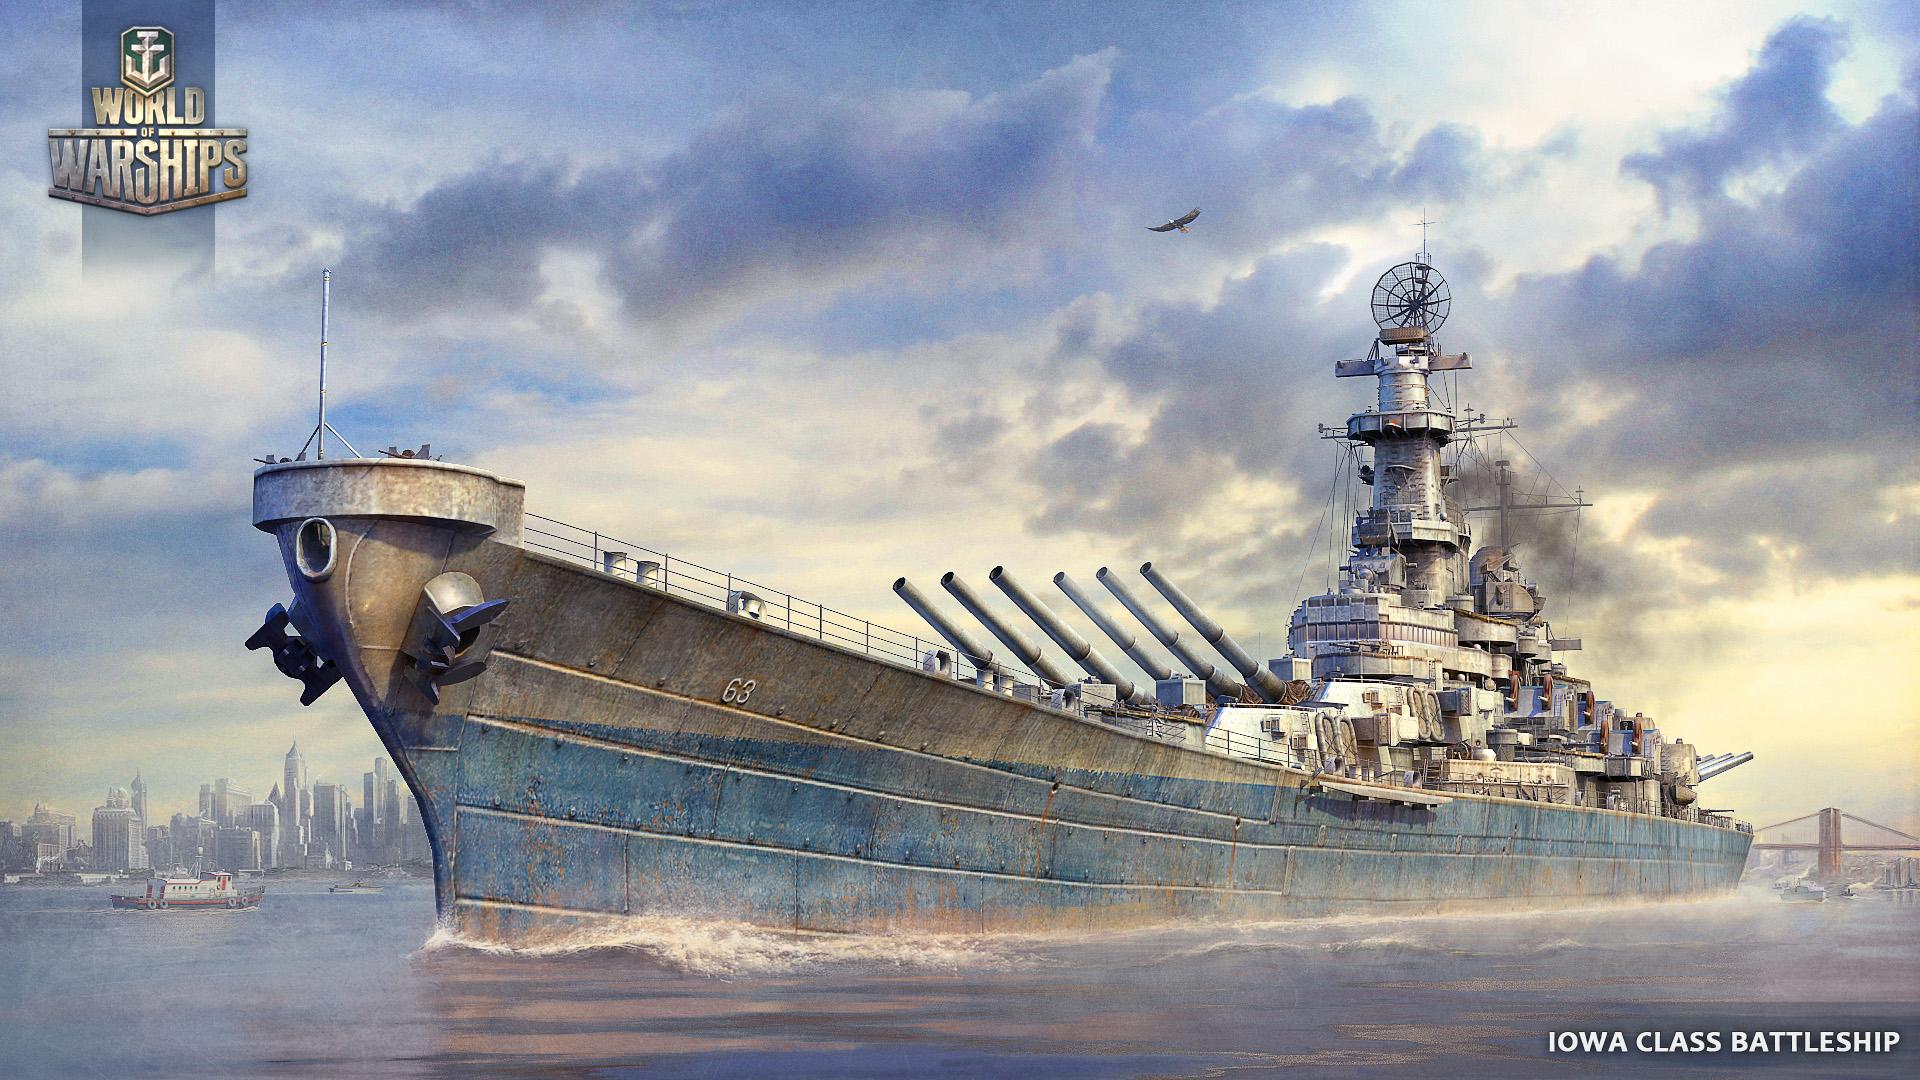 Fond ecran wallpaper World Of Warships   JeuxVideofr 1920x1080